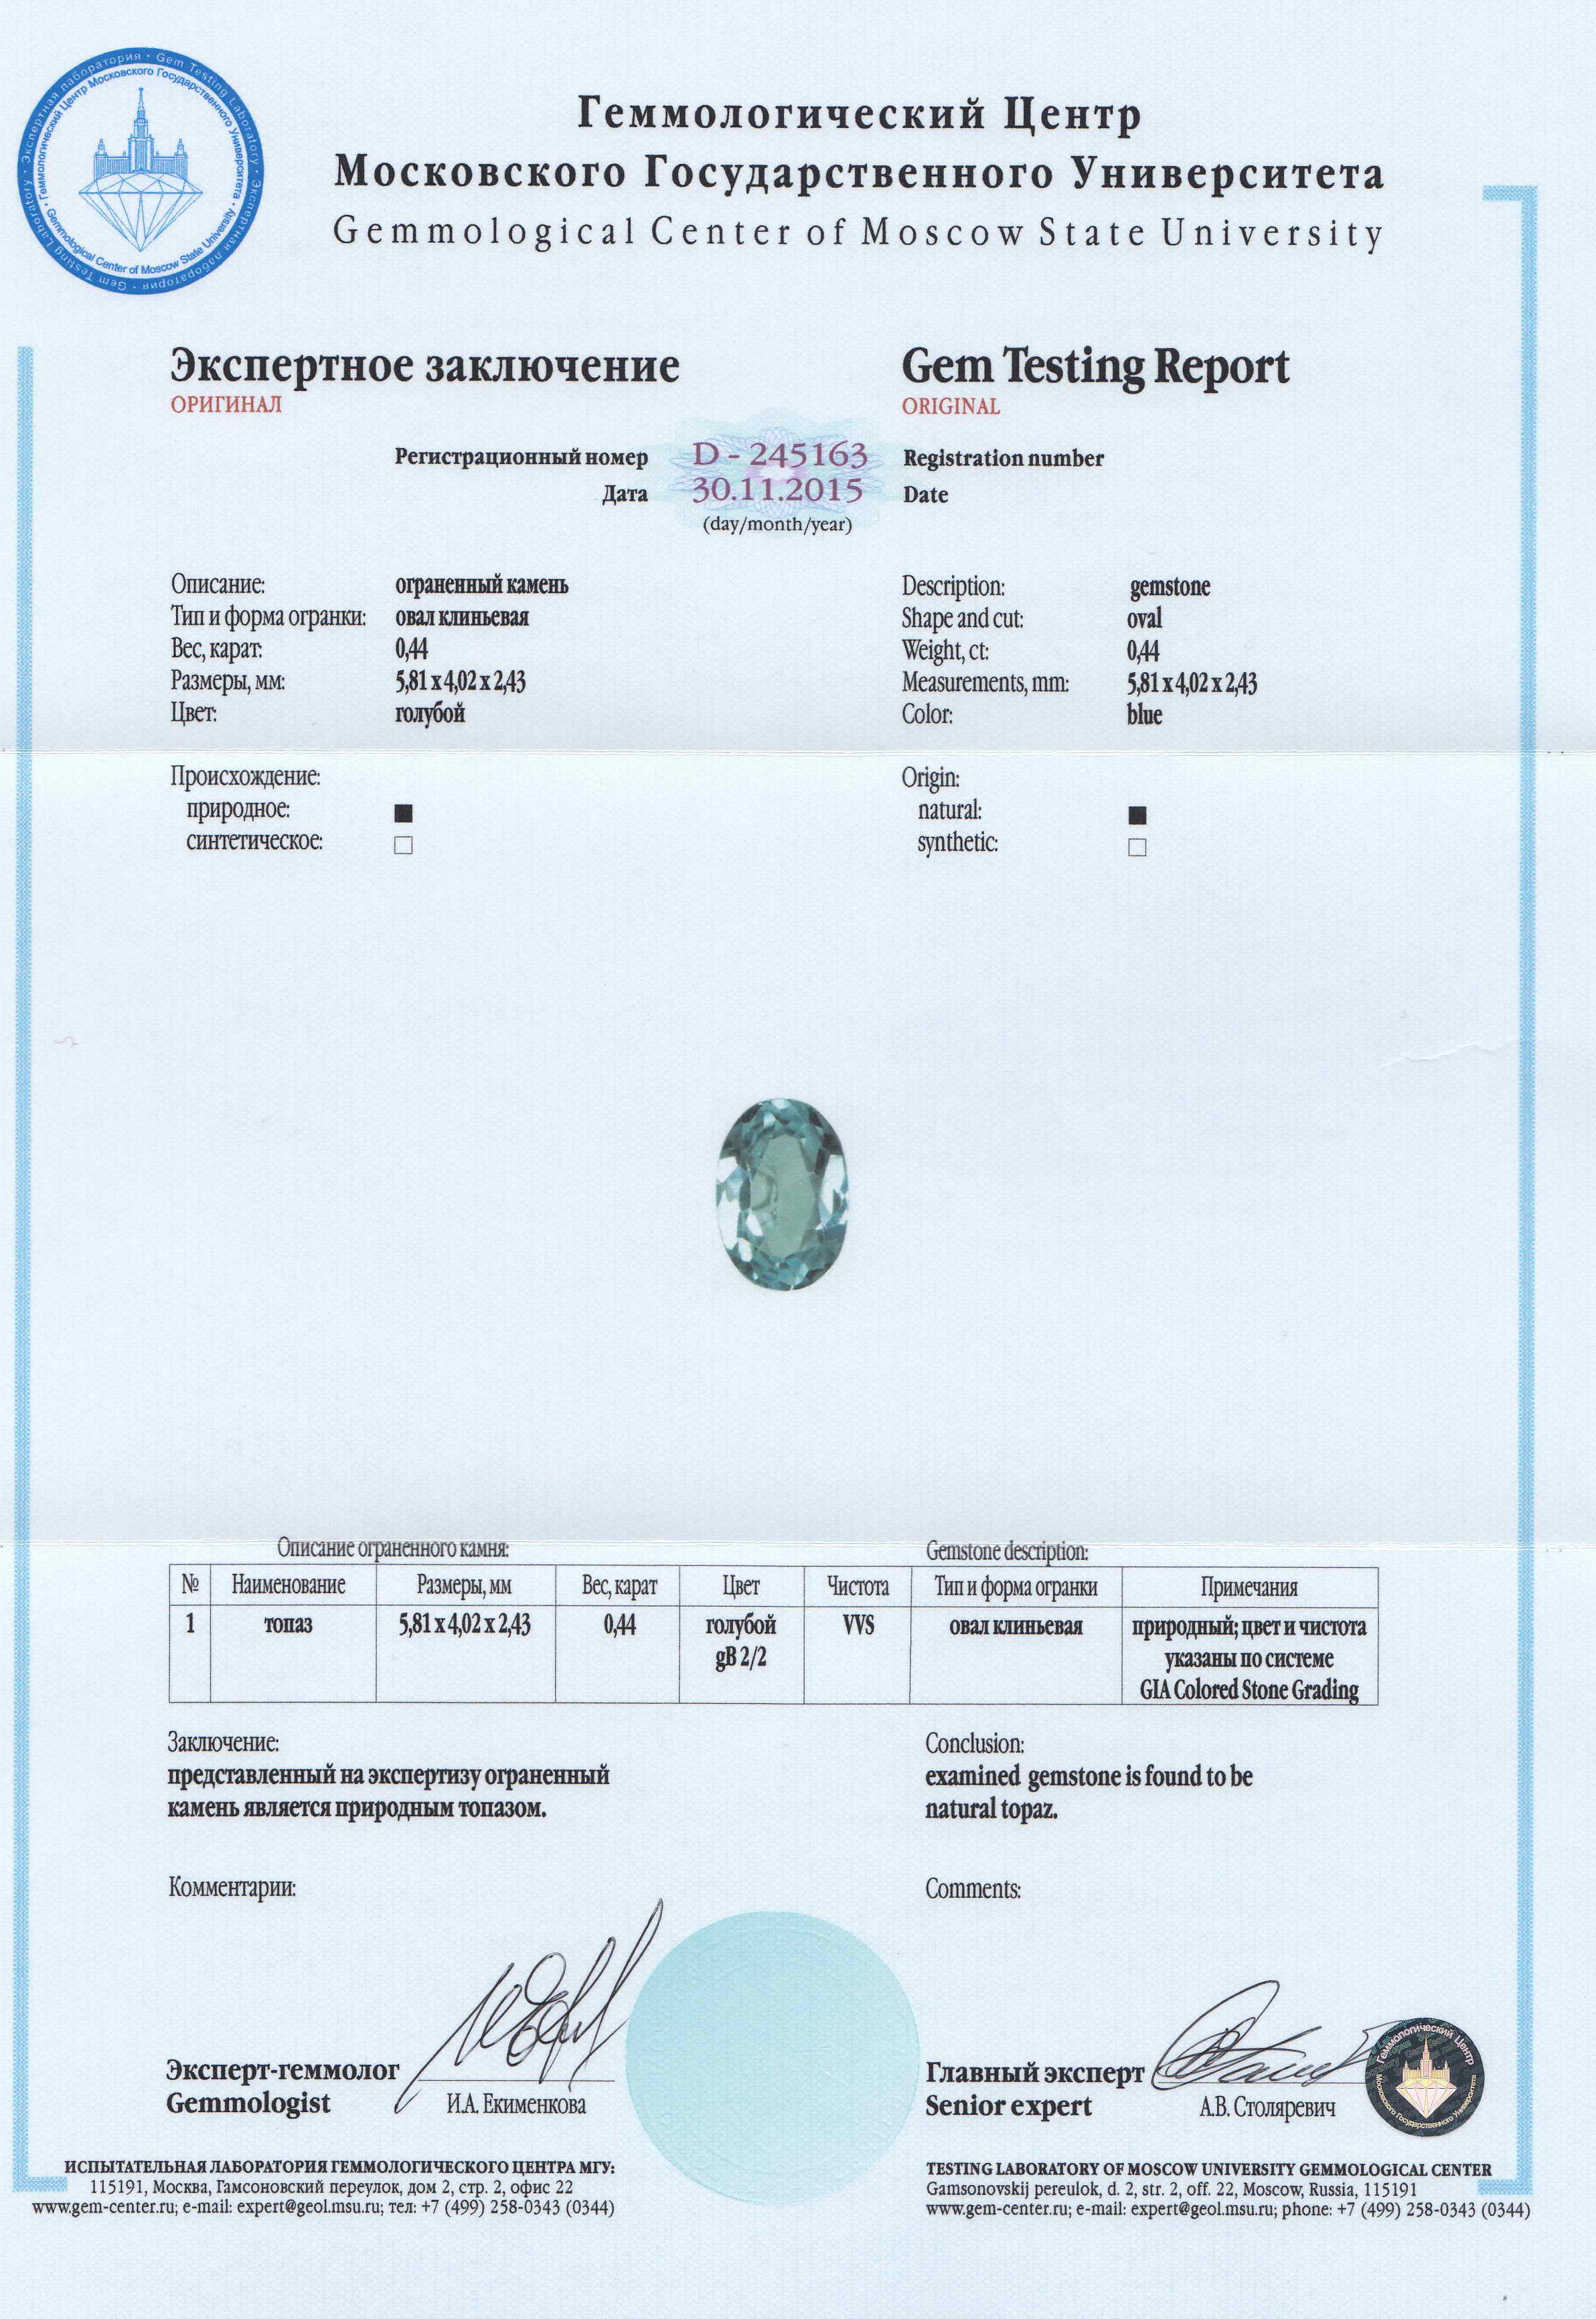 http://mineralmarket.ru/img/certificate/121.jpg